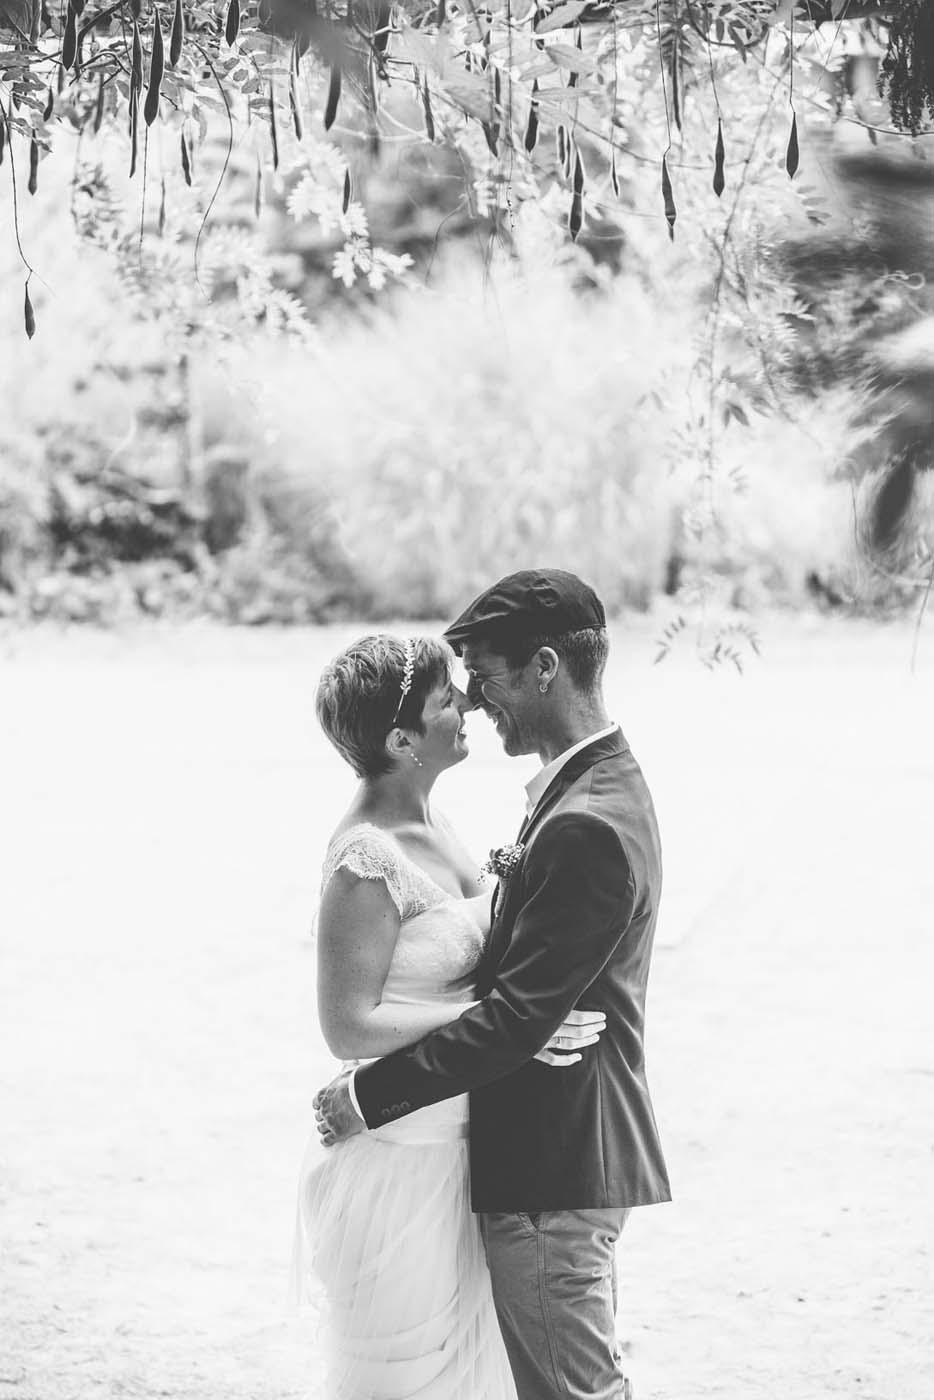 photographe mariage nantes orlane-photos.com